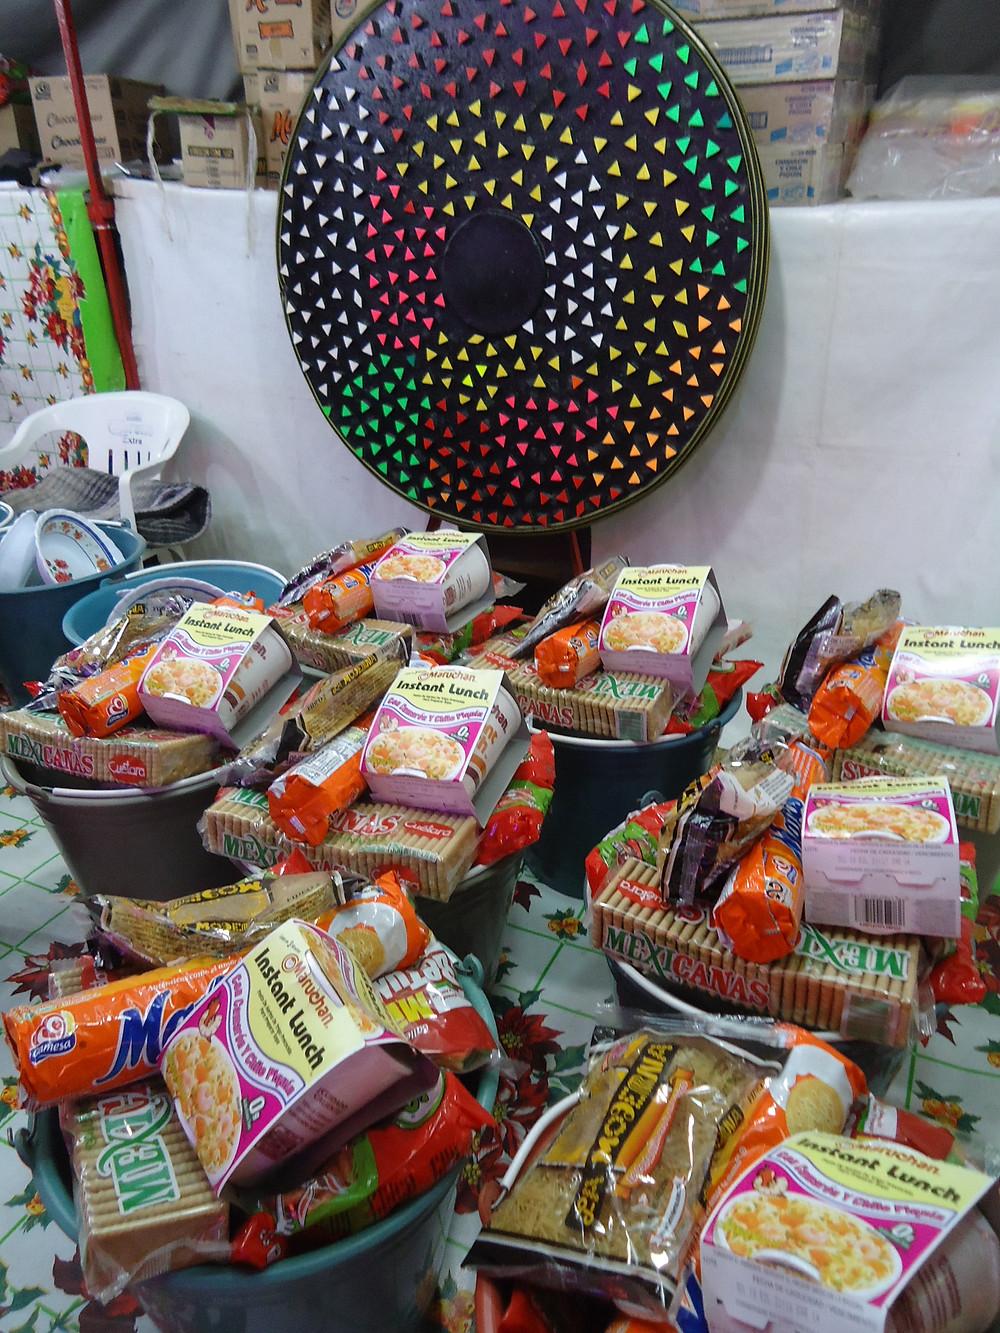 Grocery darts - Sayulita Carnival Fair in Mexico - Photo by John Early